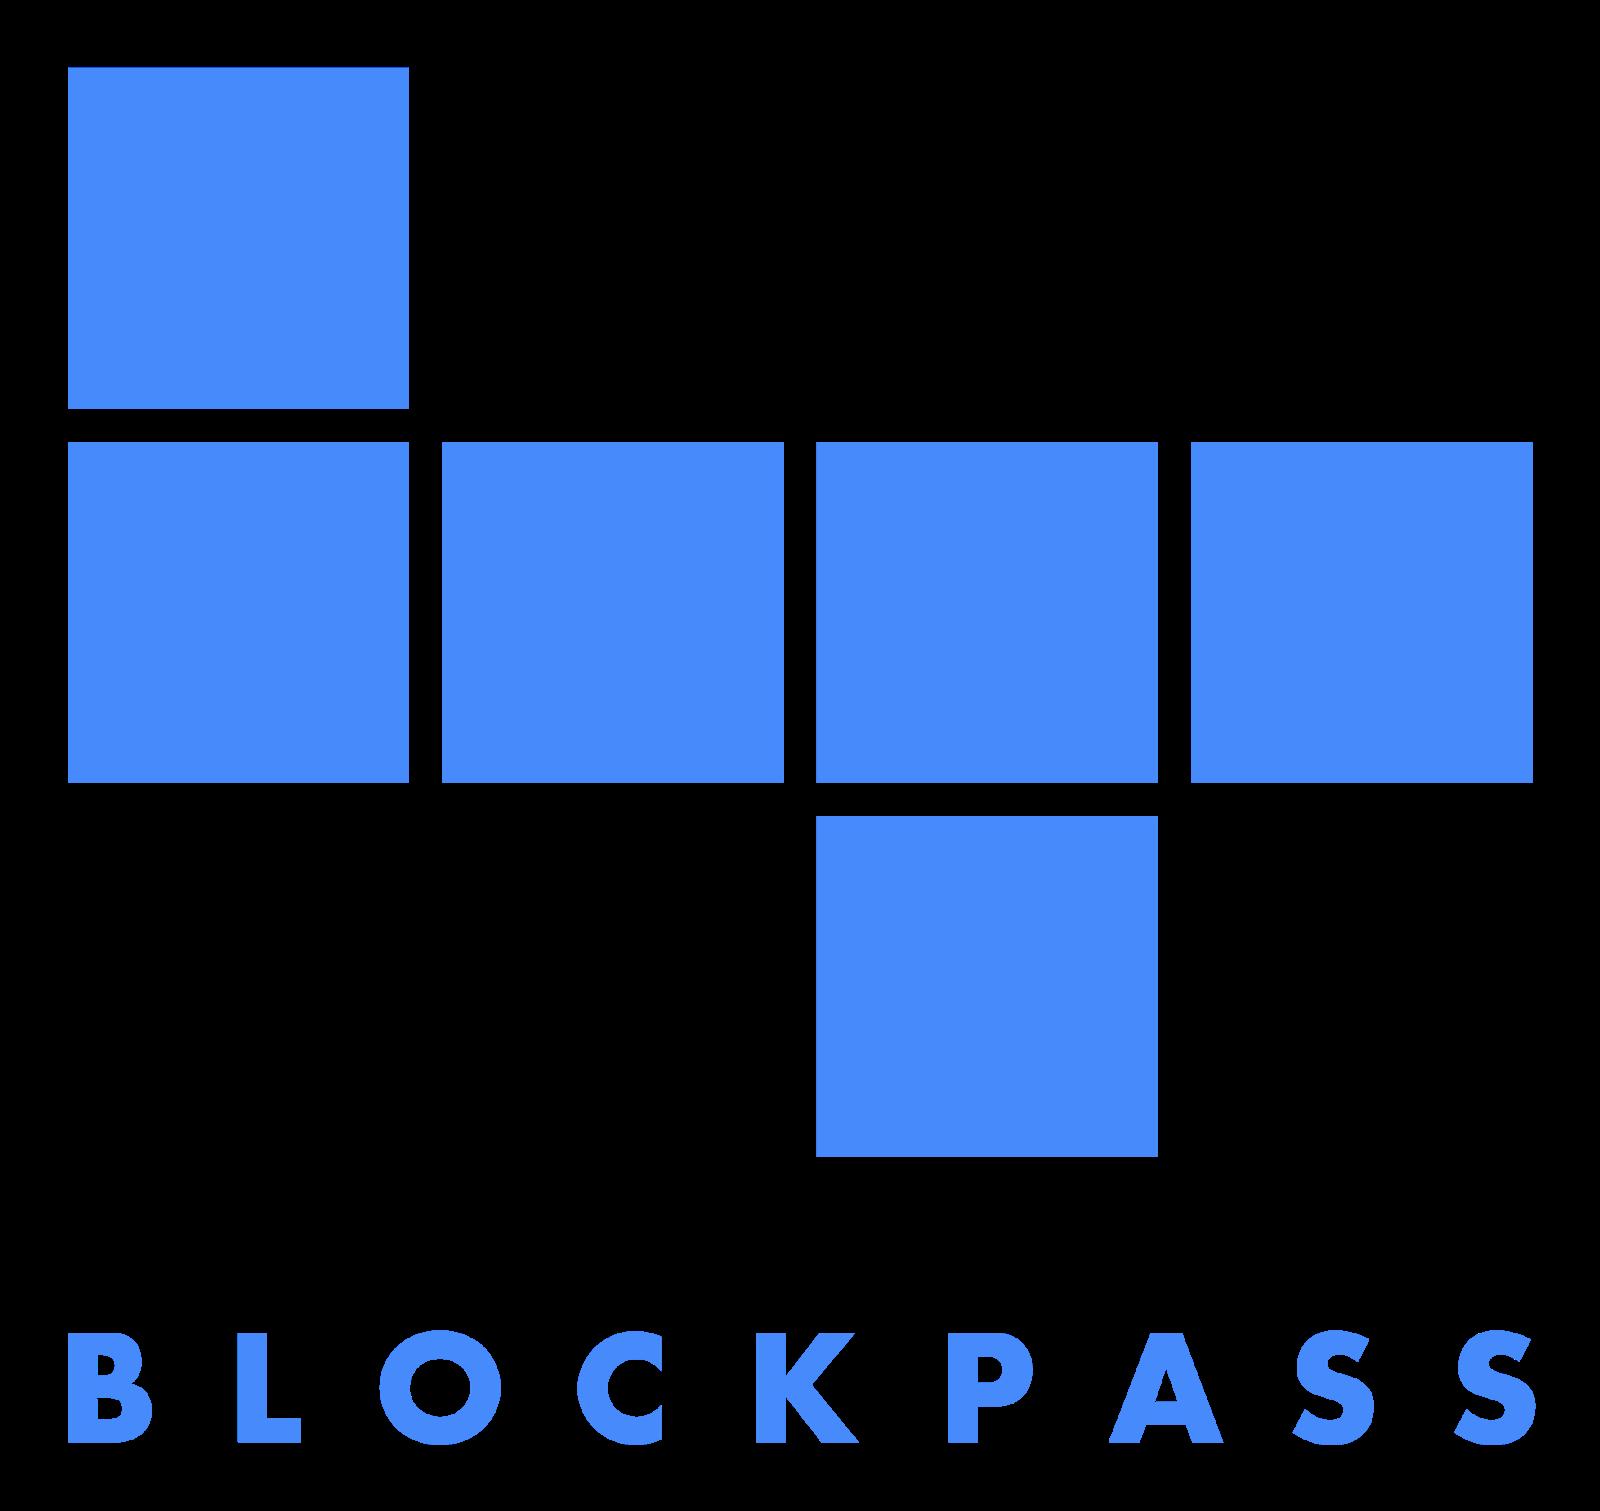 Copy of Blockpass